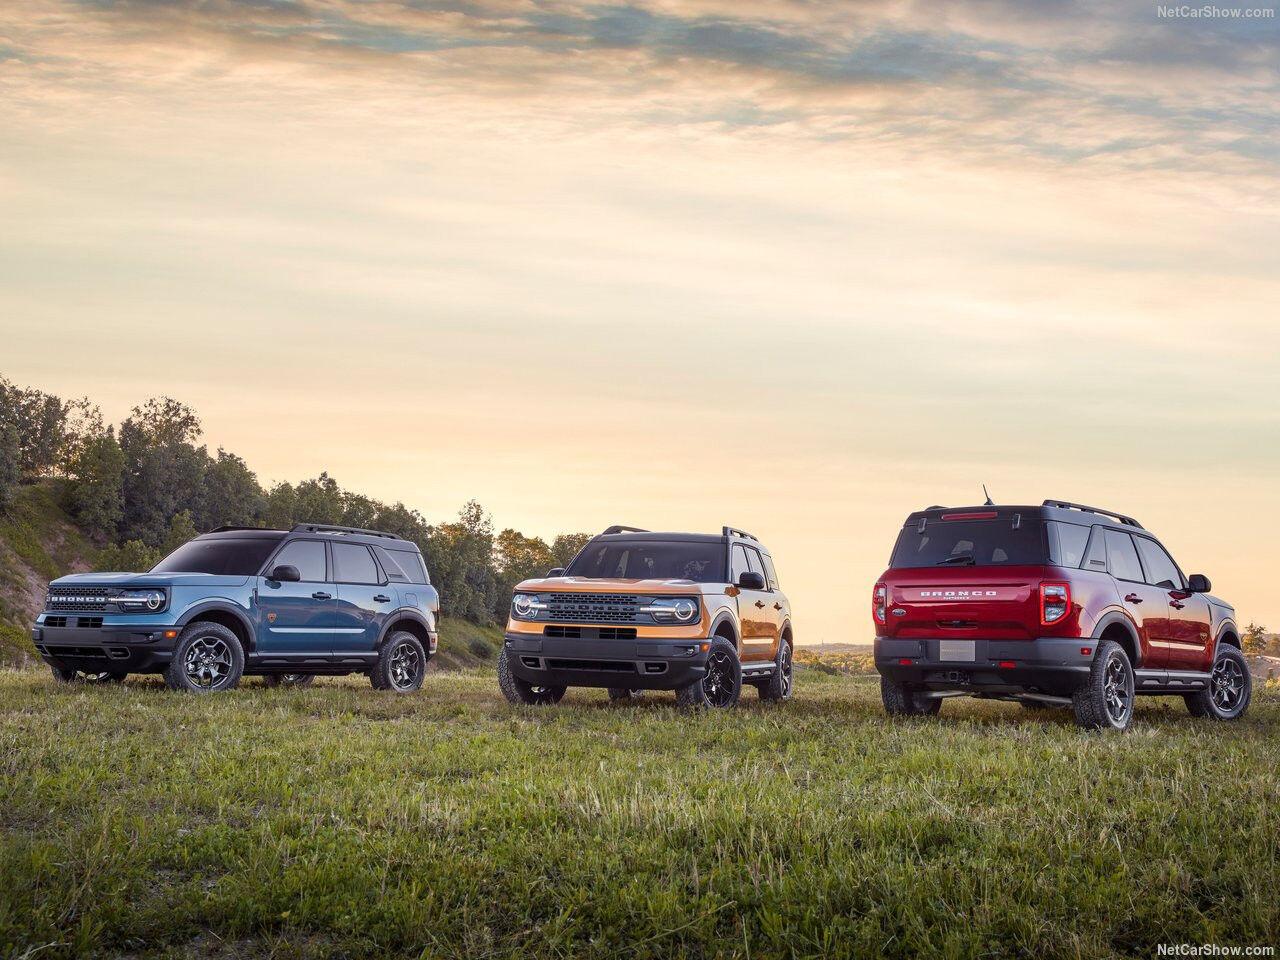 Ford Bronco Frist edition & Badlands 4x4